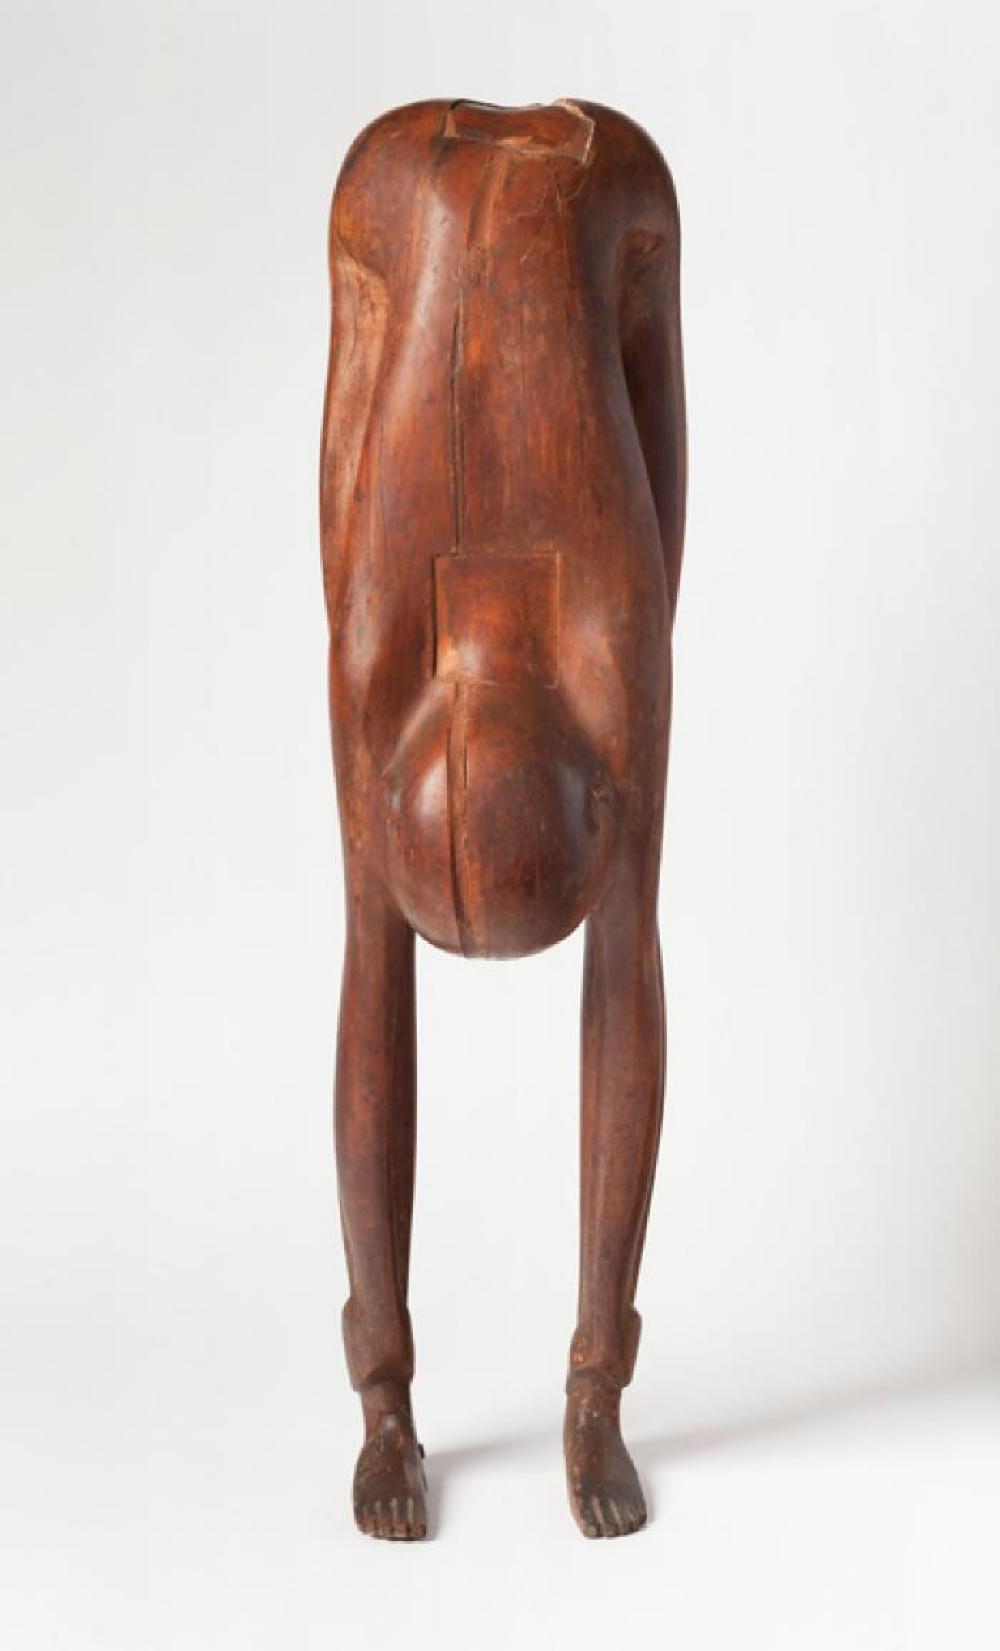 Boy Looking through Legs, image 13